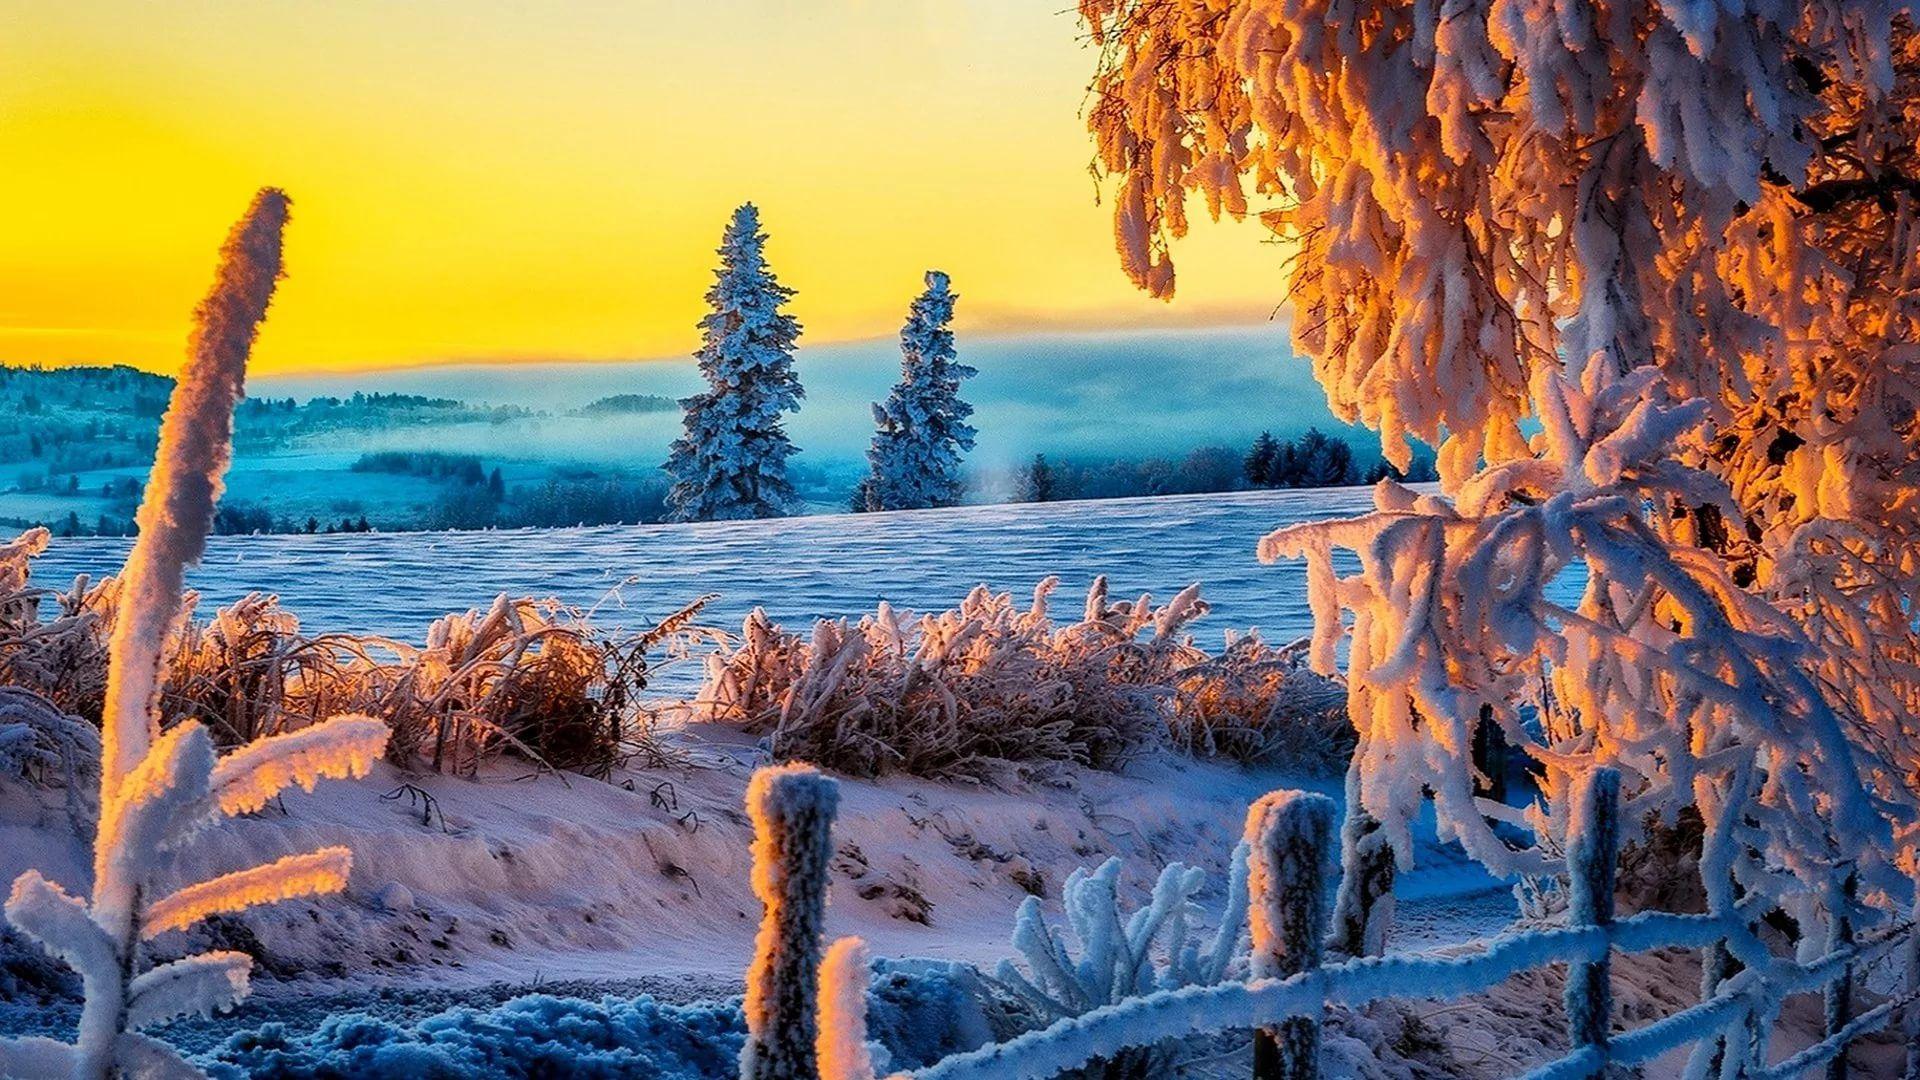 Cute Winter good wallpaper hd